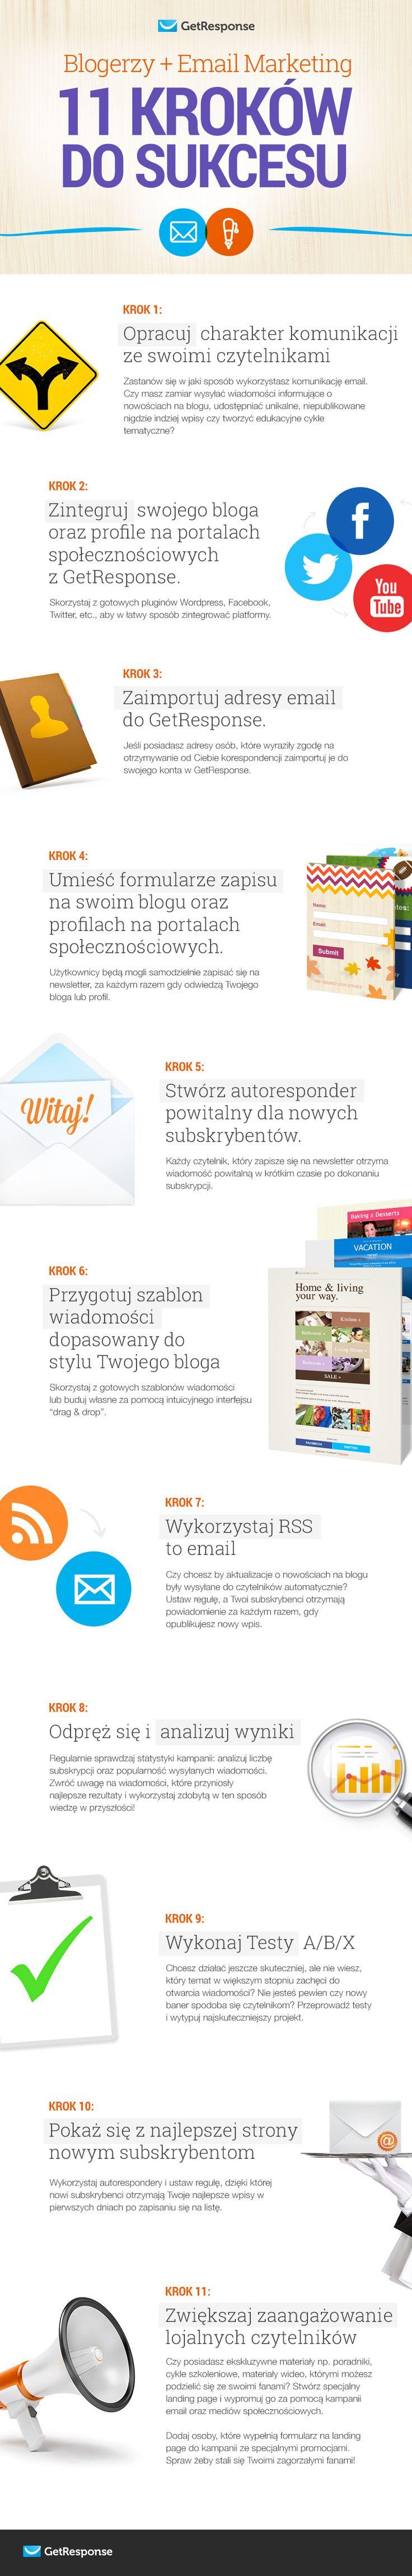 Infografika Blogerzy + Email Marketing